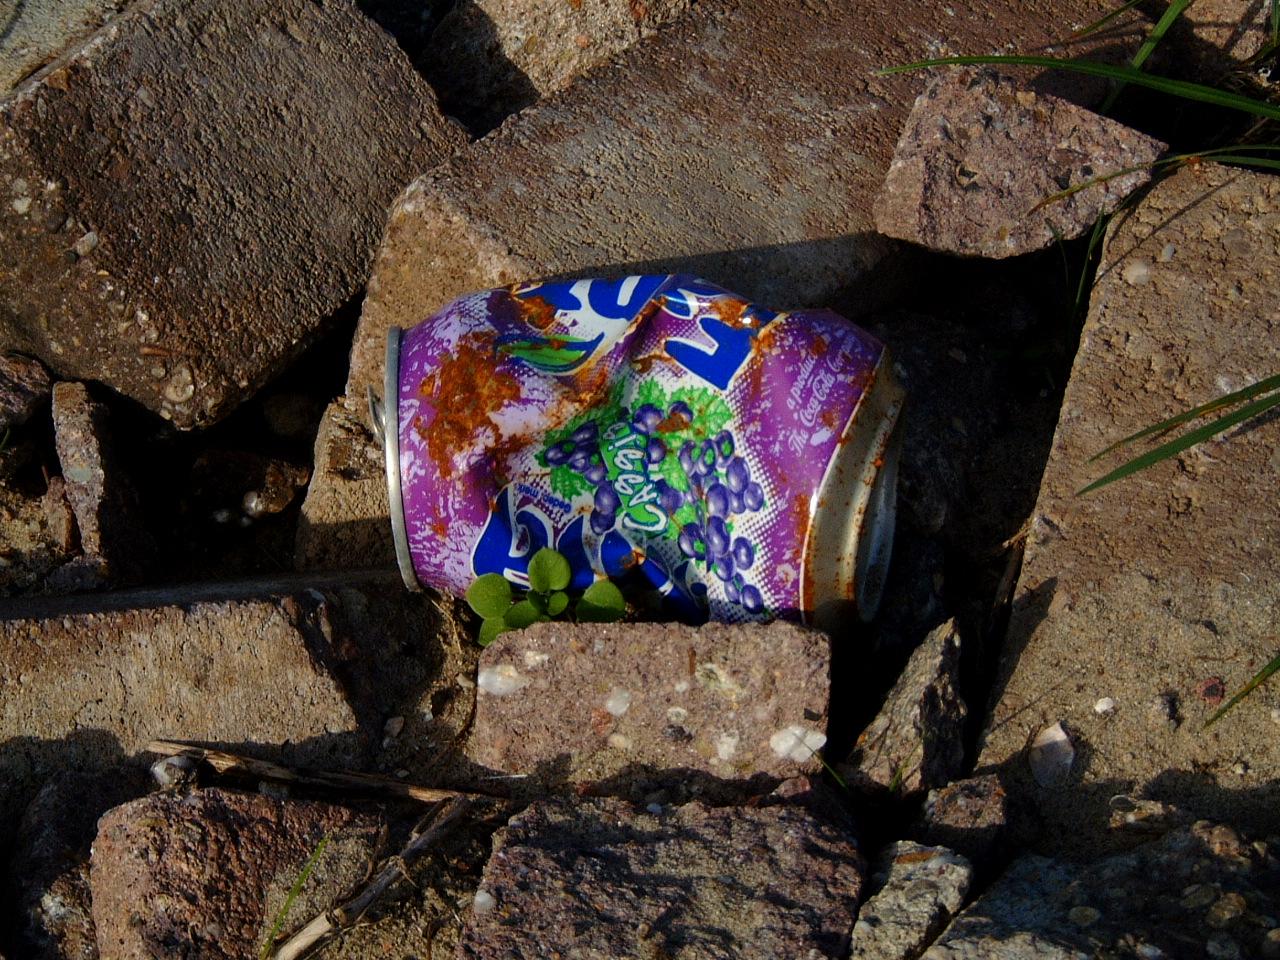 maartent fanta can crushed trash rubbish soda